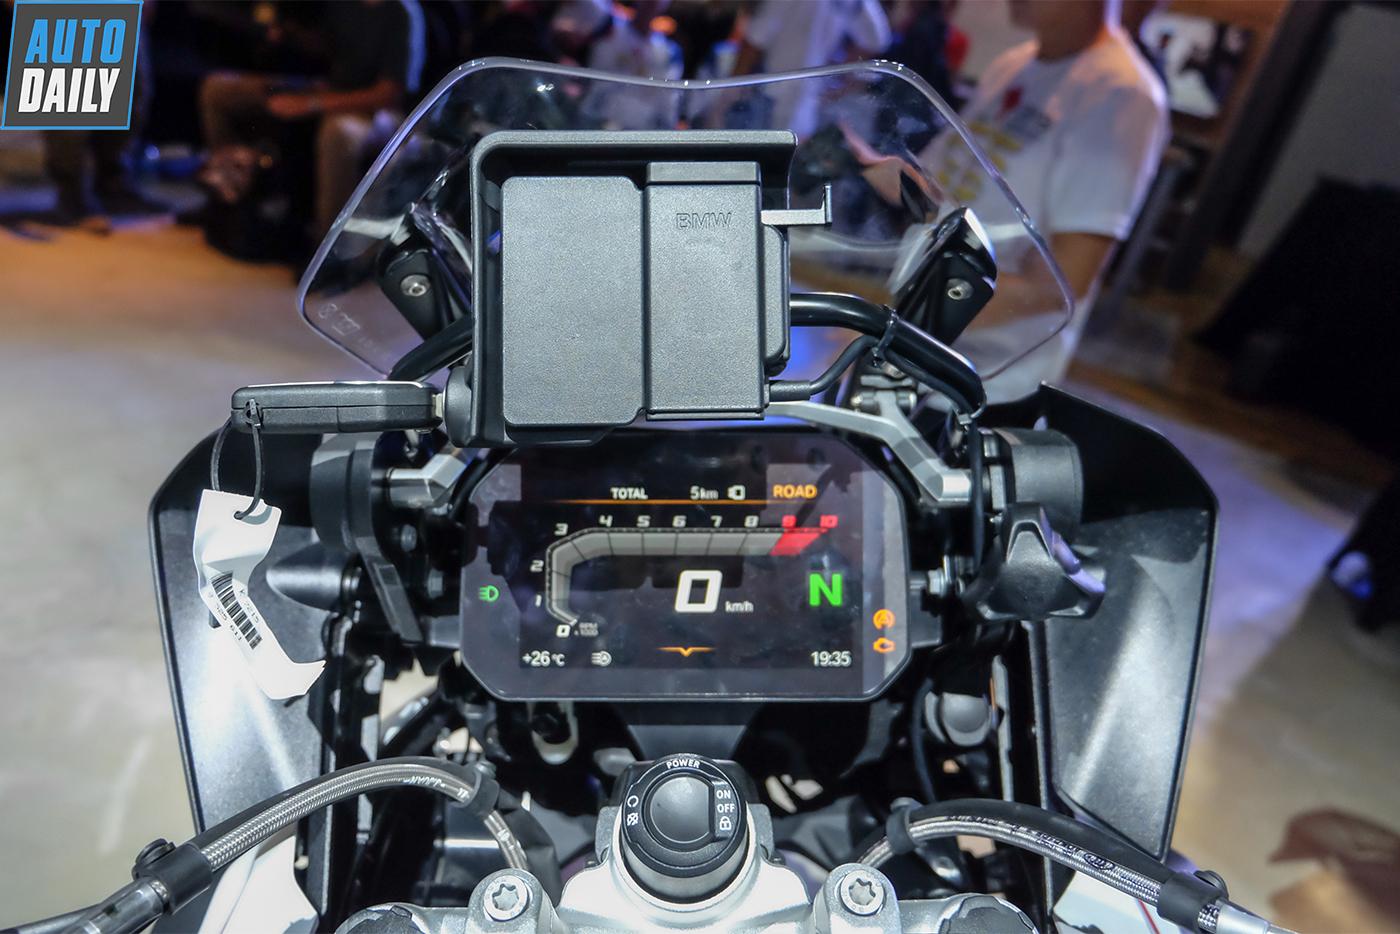 bmw-motorrad-r-1250-gs-2019-25.jpg